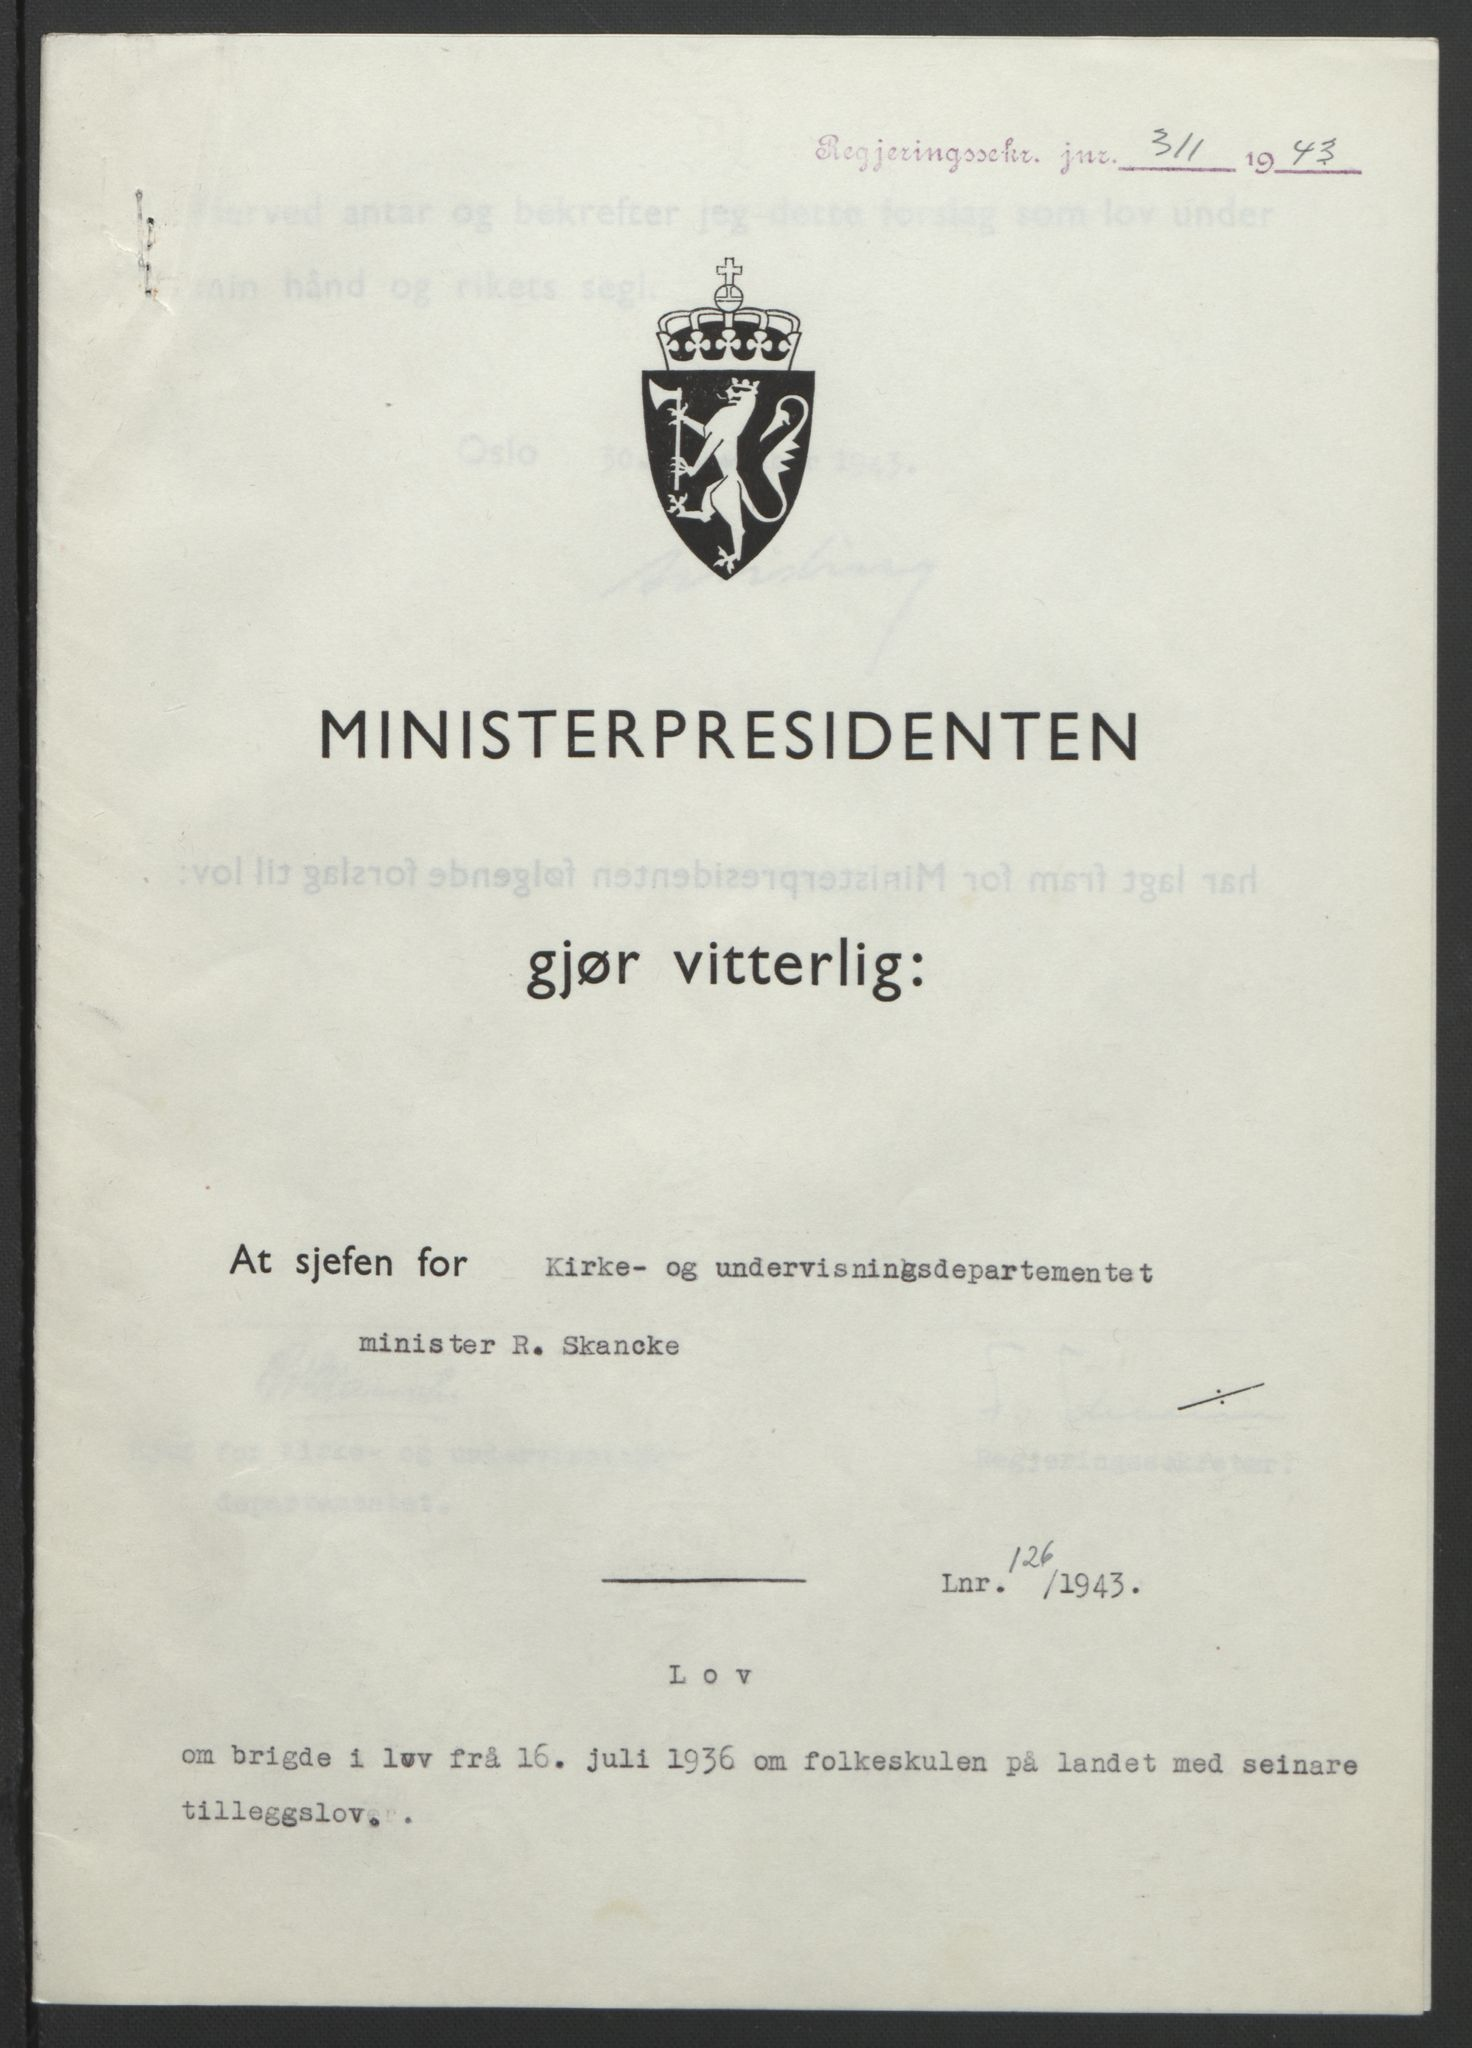 RA, NS-administrasjonen 1940-1945 (Statsrådsekretariatet, de kommisariske statsråder mm), D/Db/L0099: Lover, 1943, s. 584